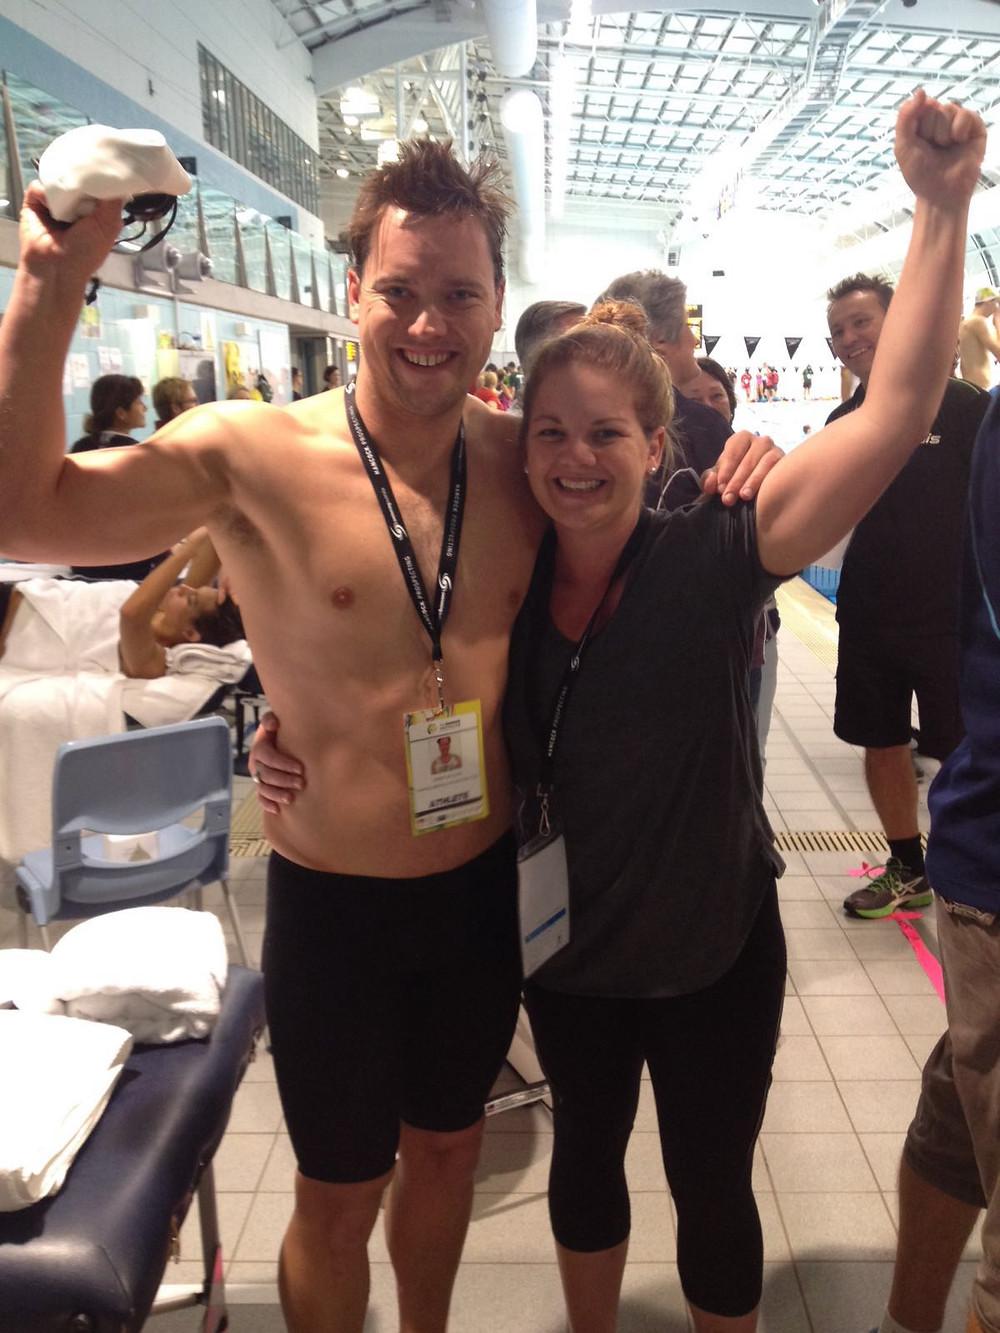 Jeremy and wife, Heidi celebrating his achievement